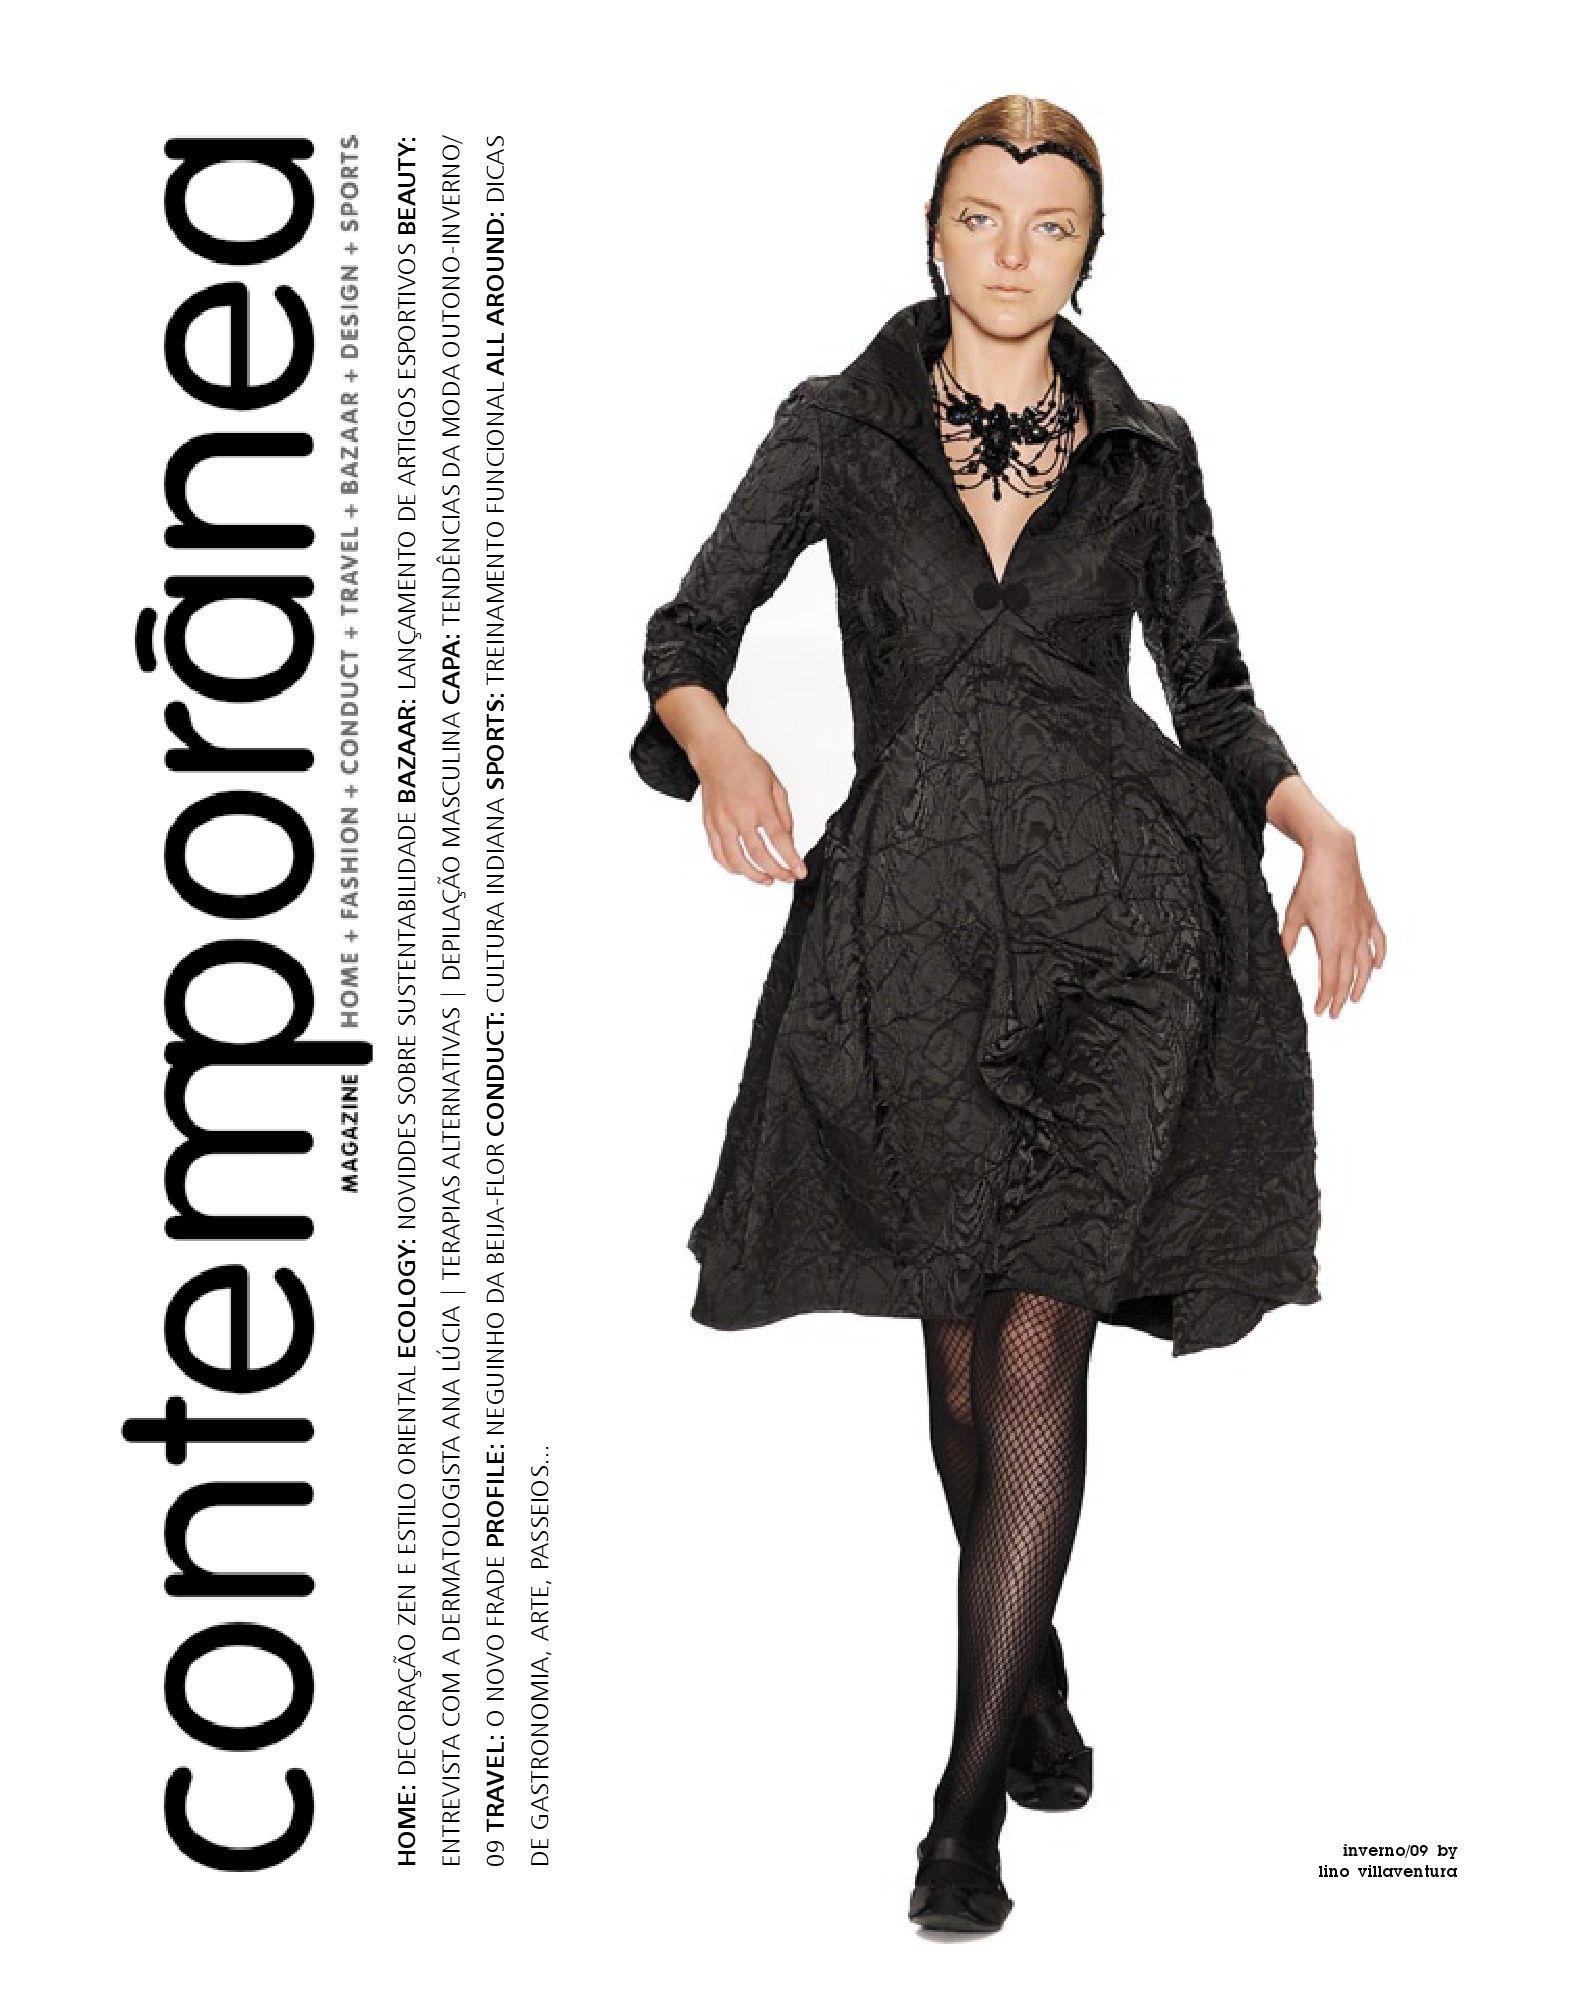 revista contemporanea - fev 08 by erick hurpia - issuu fd0849bb007e2